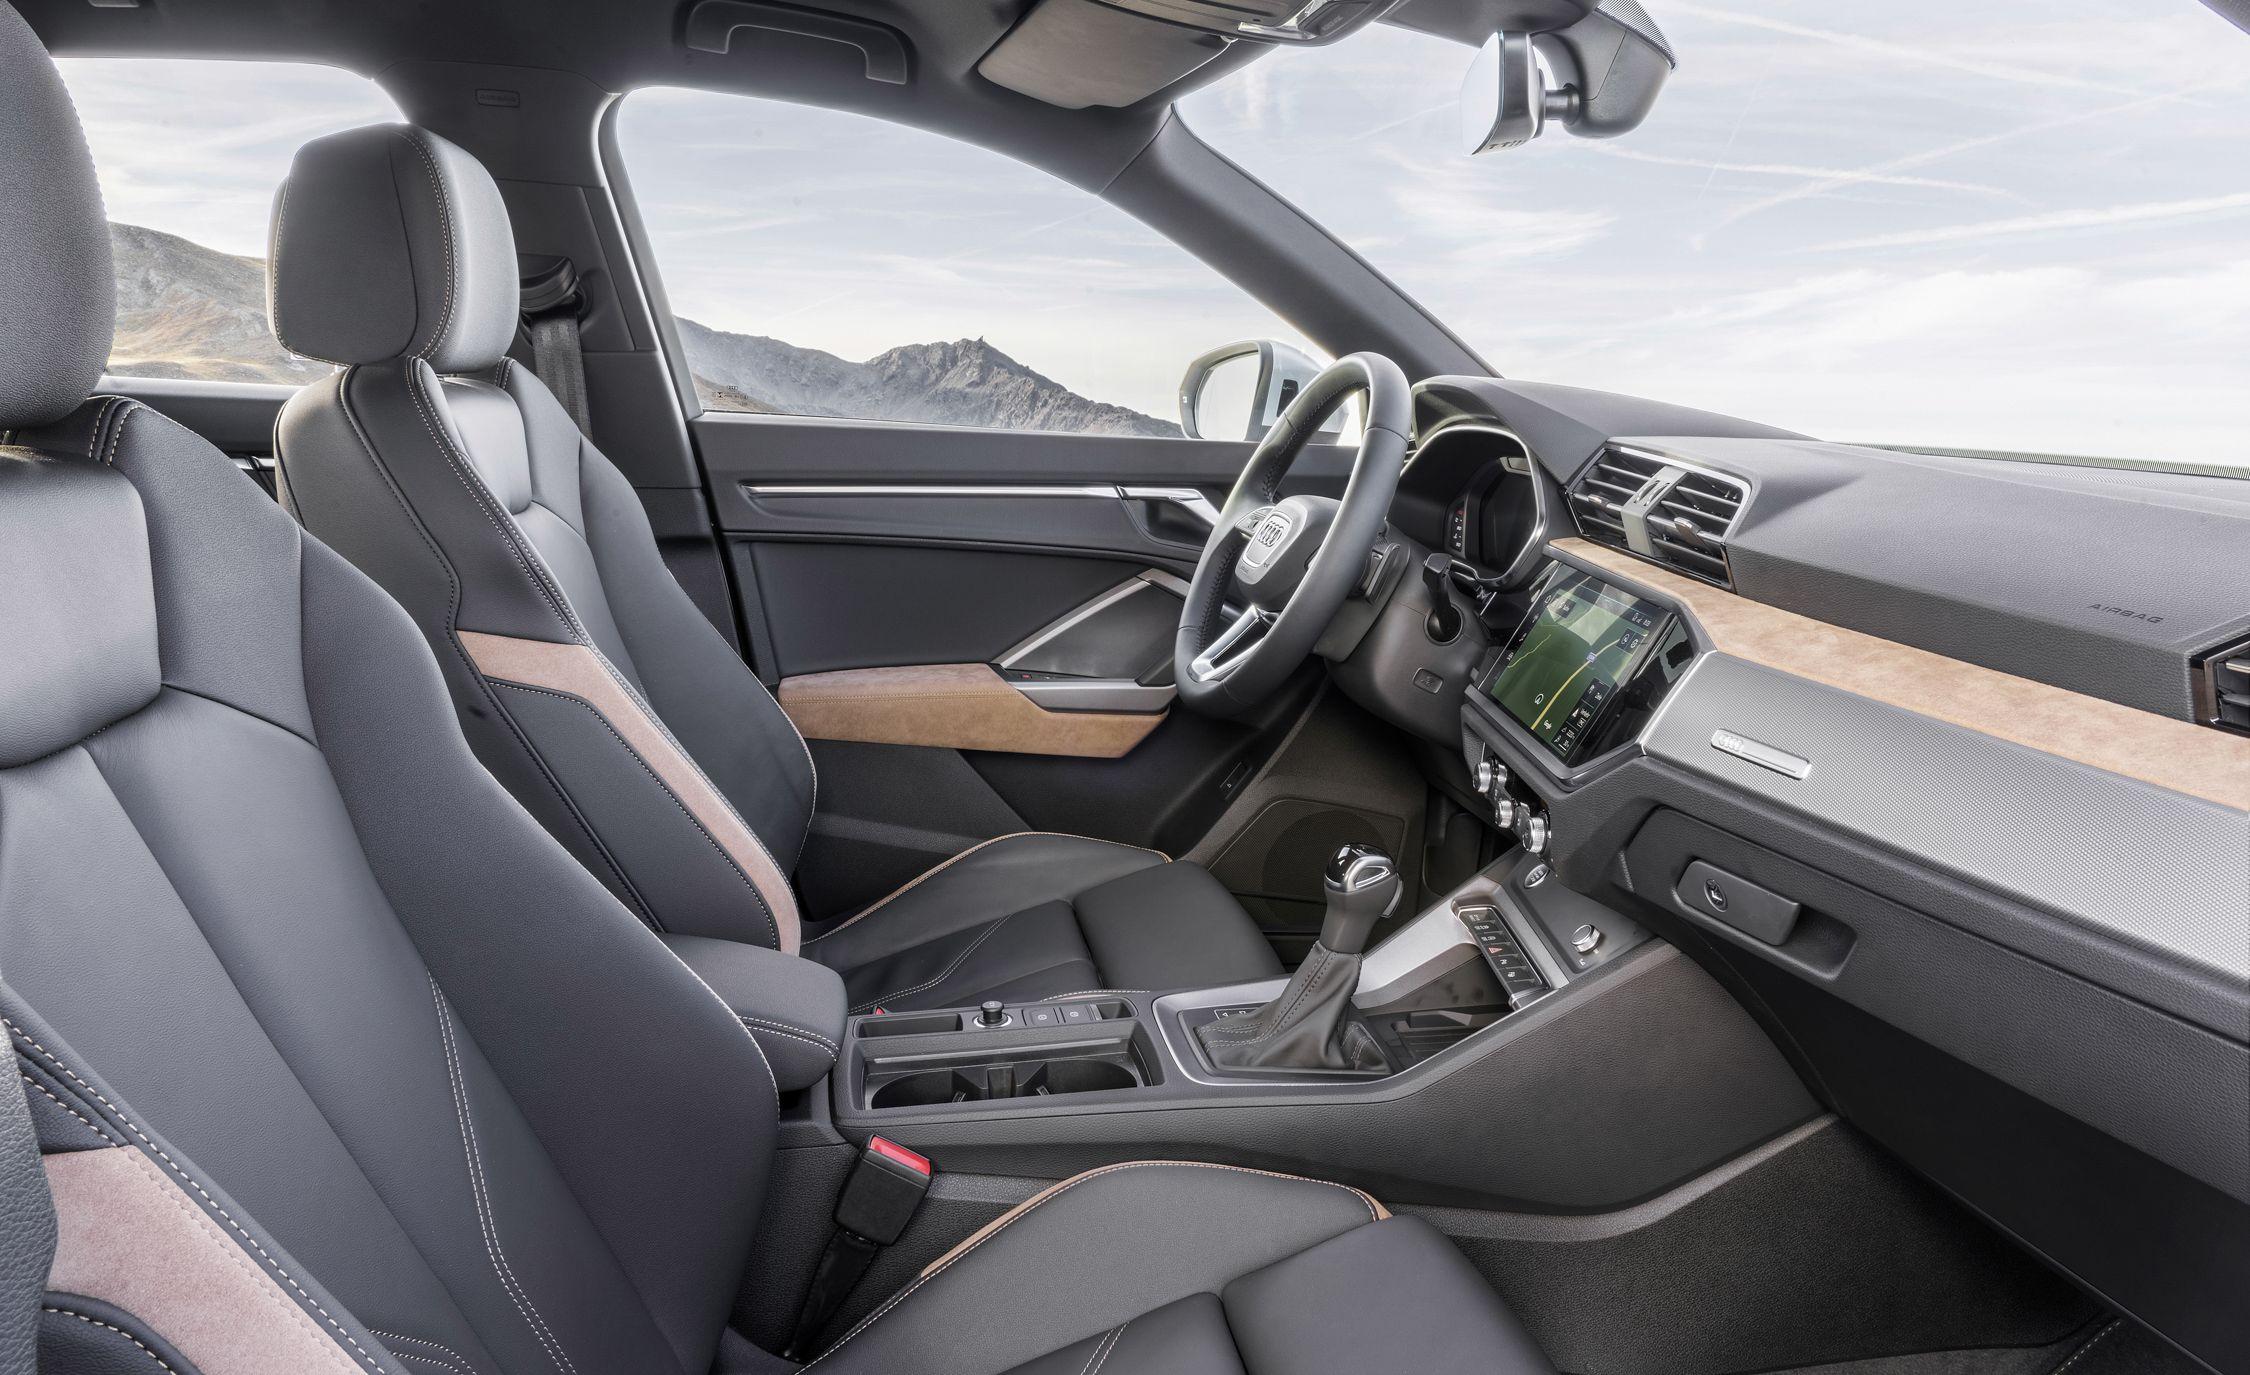 Audi Q Review The Audi Car - Audi q3 review